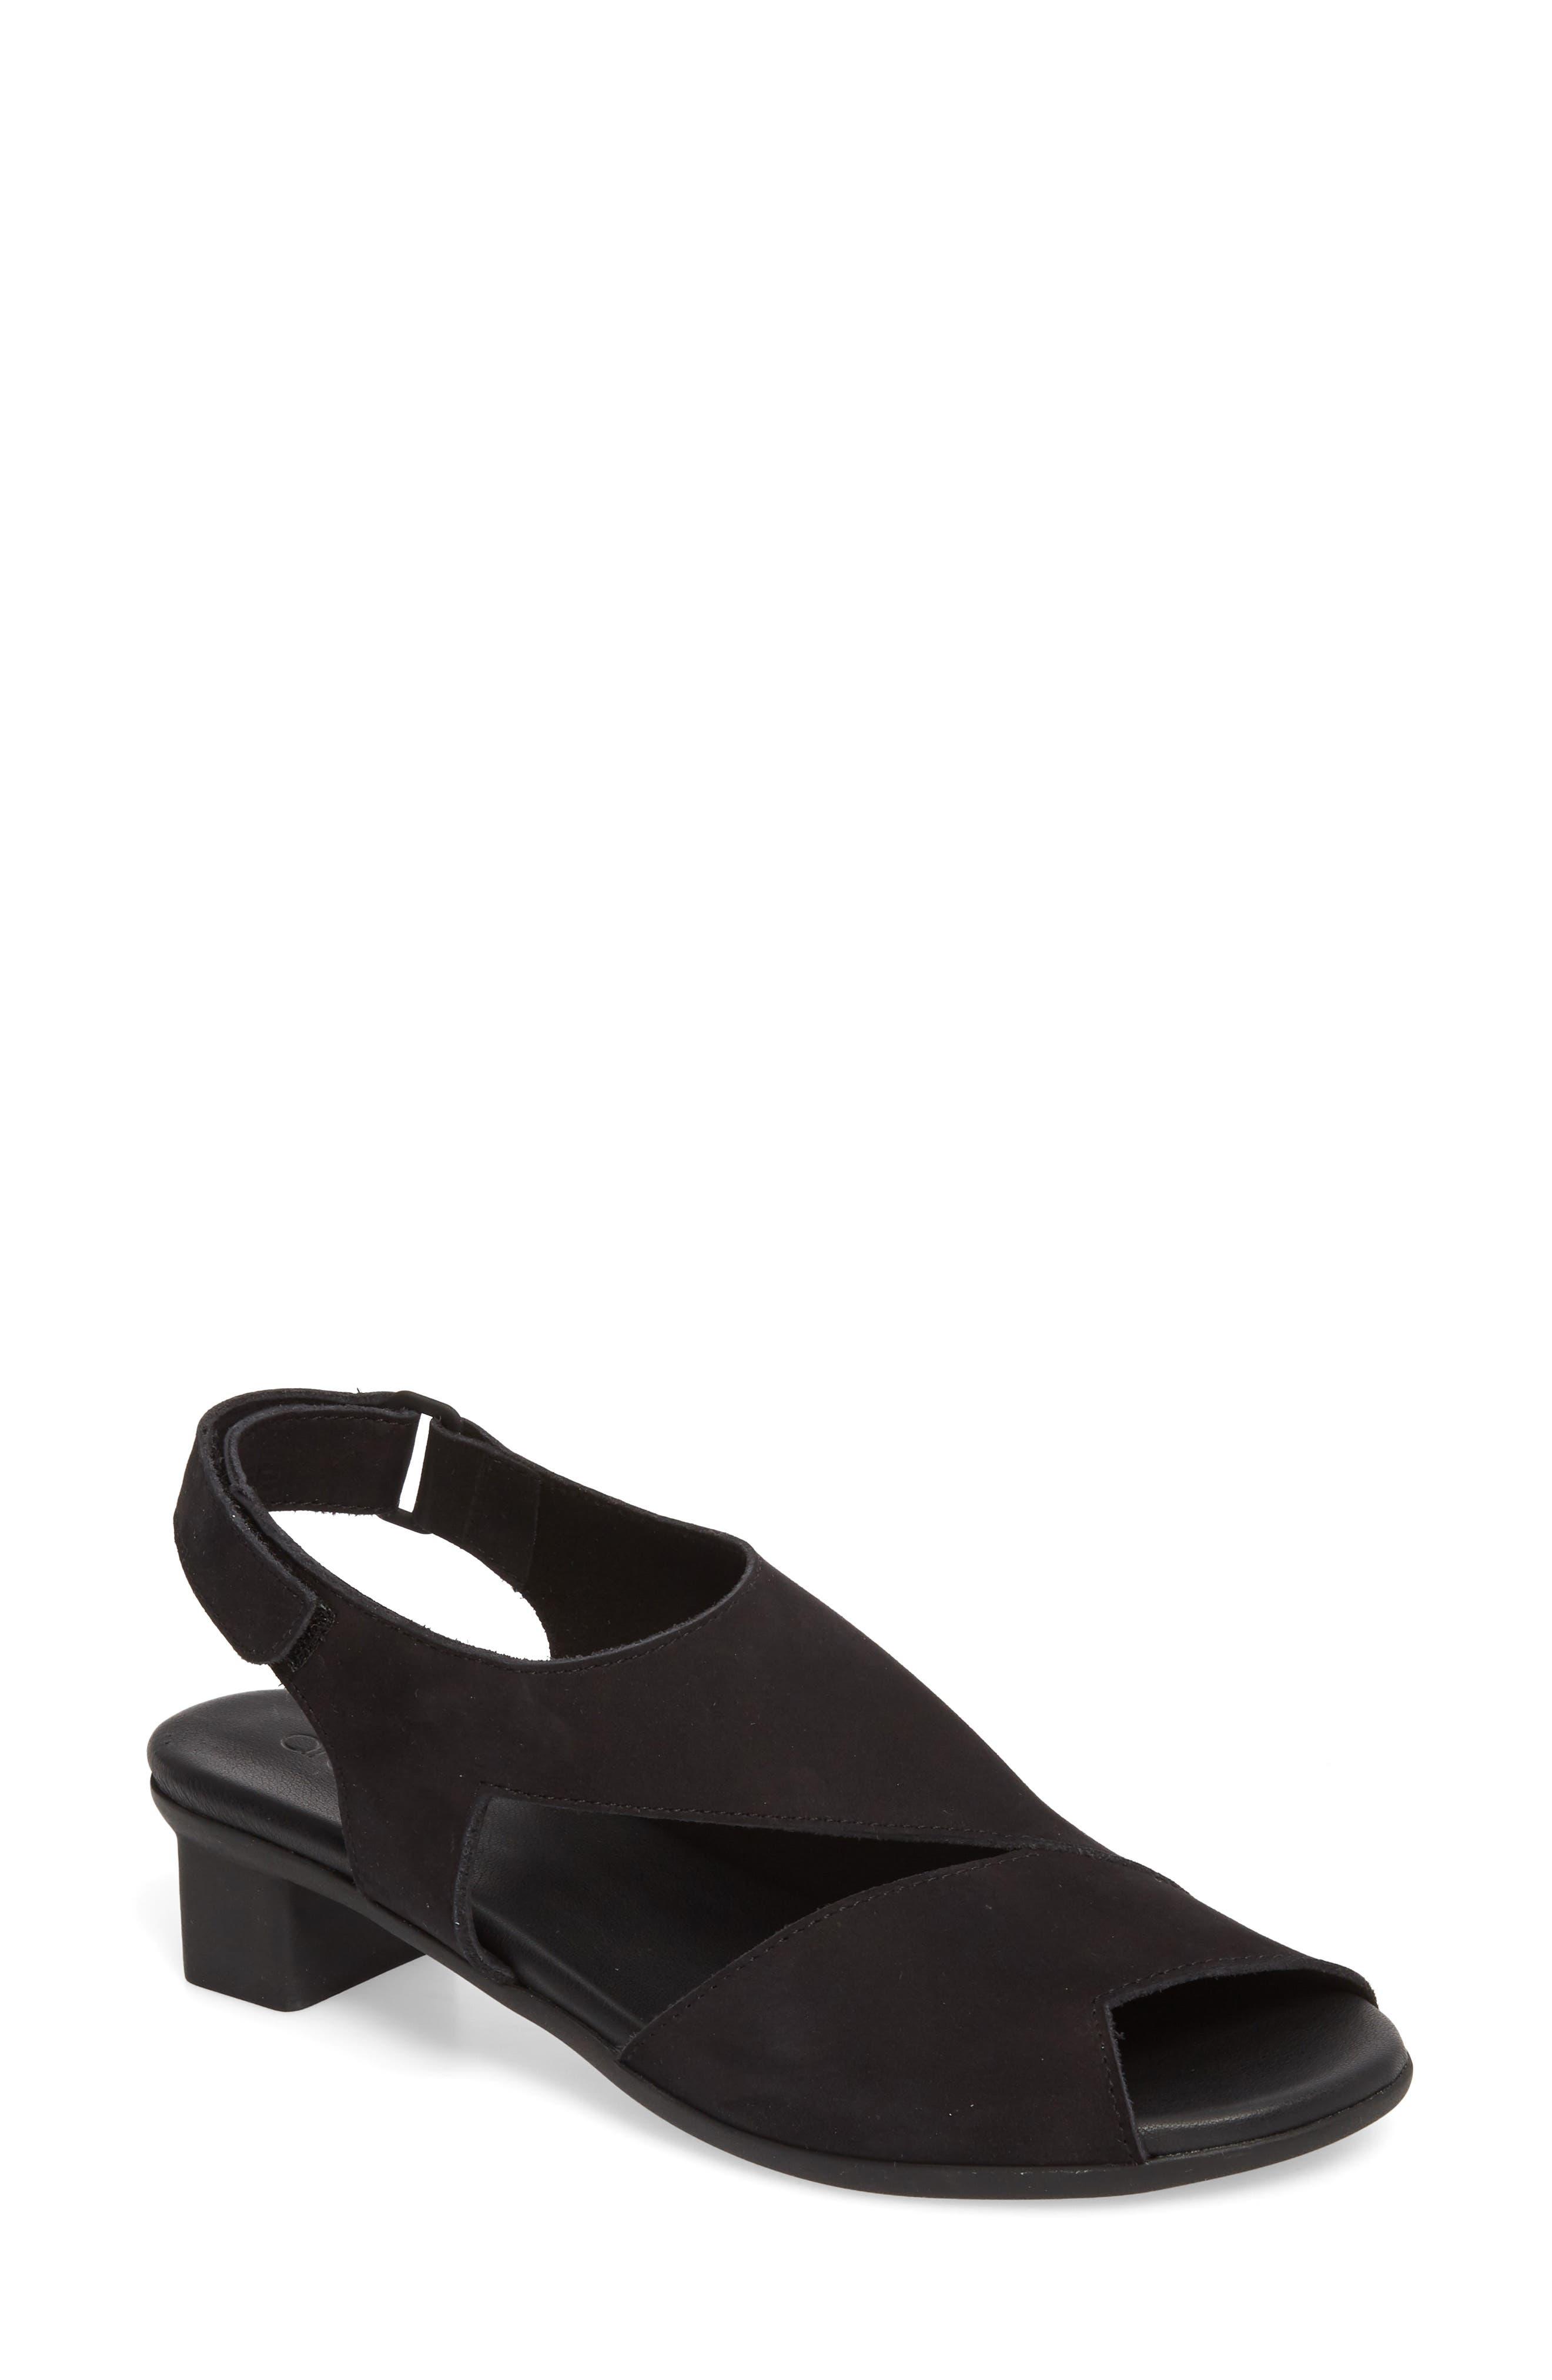 Obibbi Asymmetrical Slingback Sandal,                         Main,                         color, NOIR NUBUCK